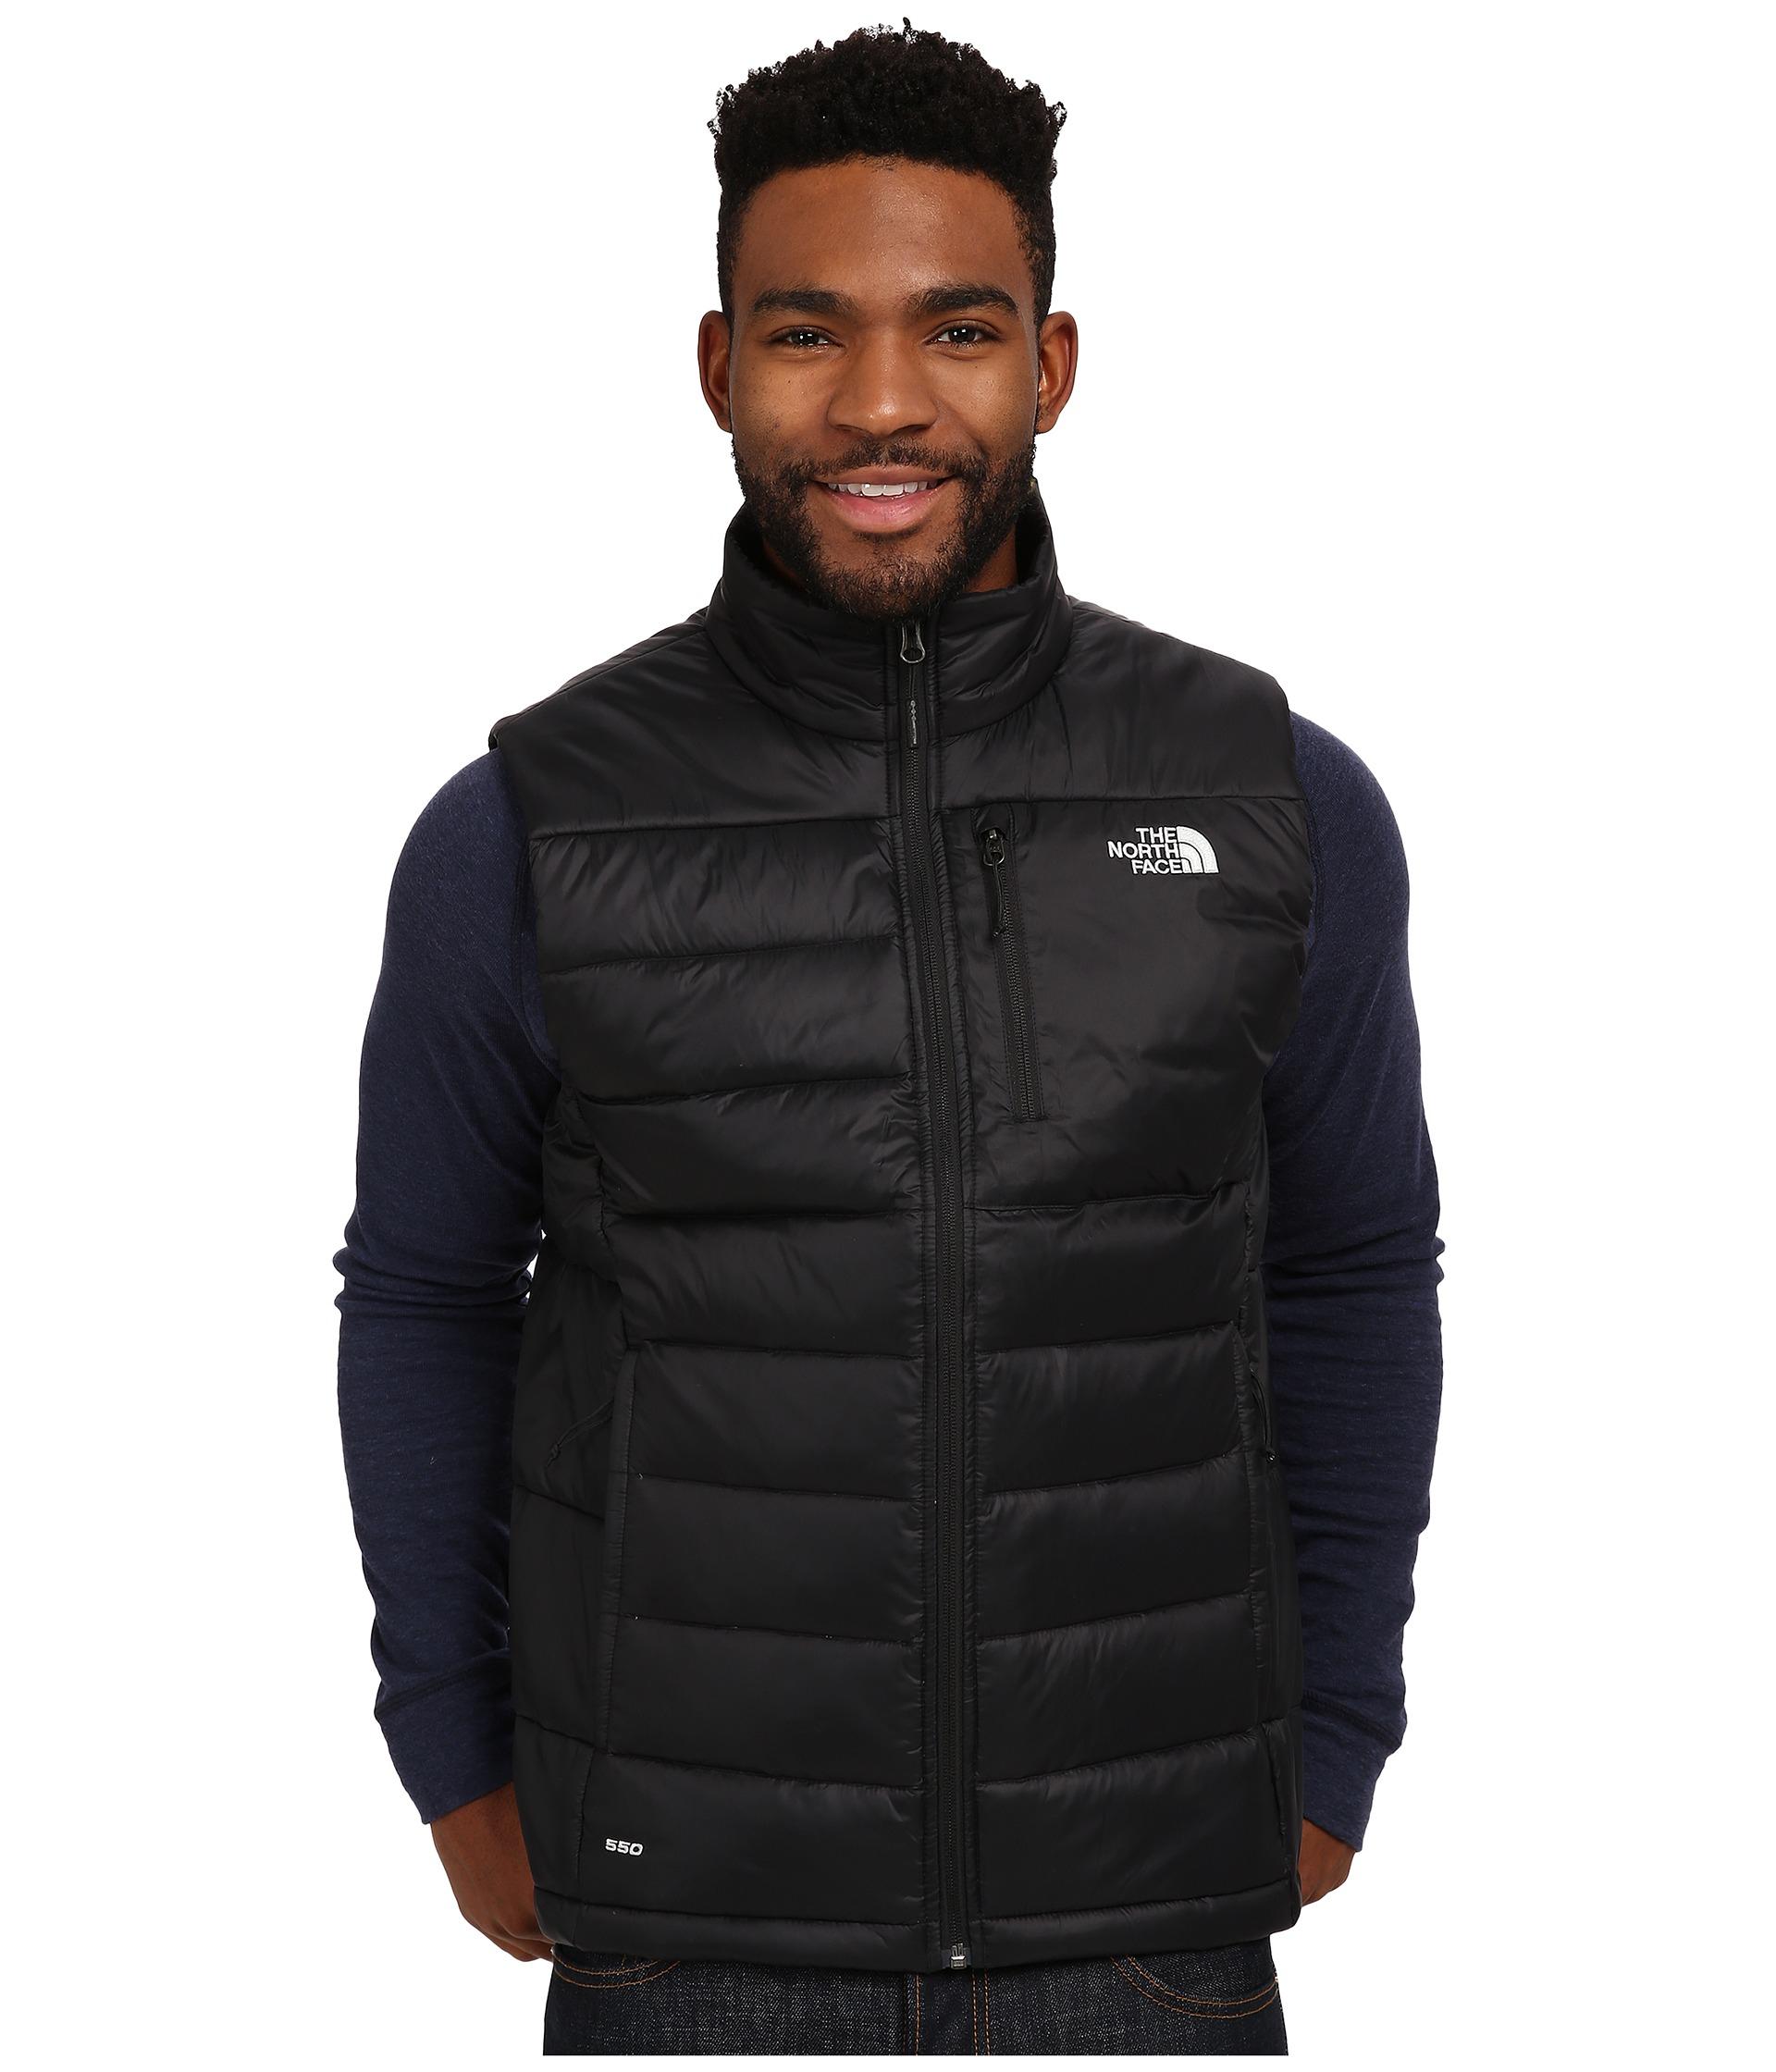 Lyst The North Face Aconcagua Vest In Black For Men